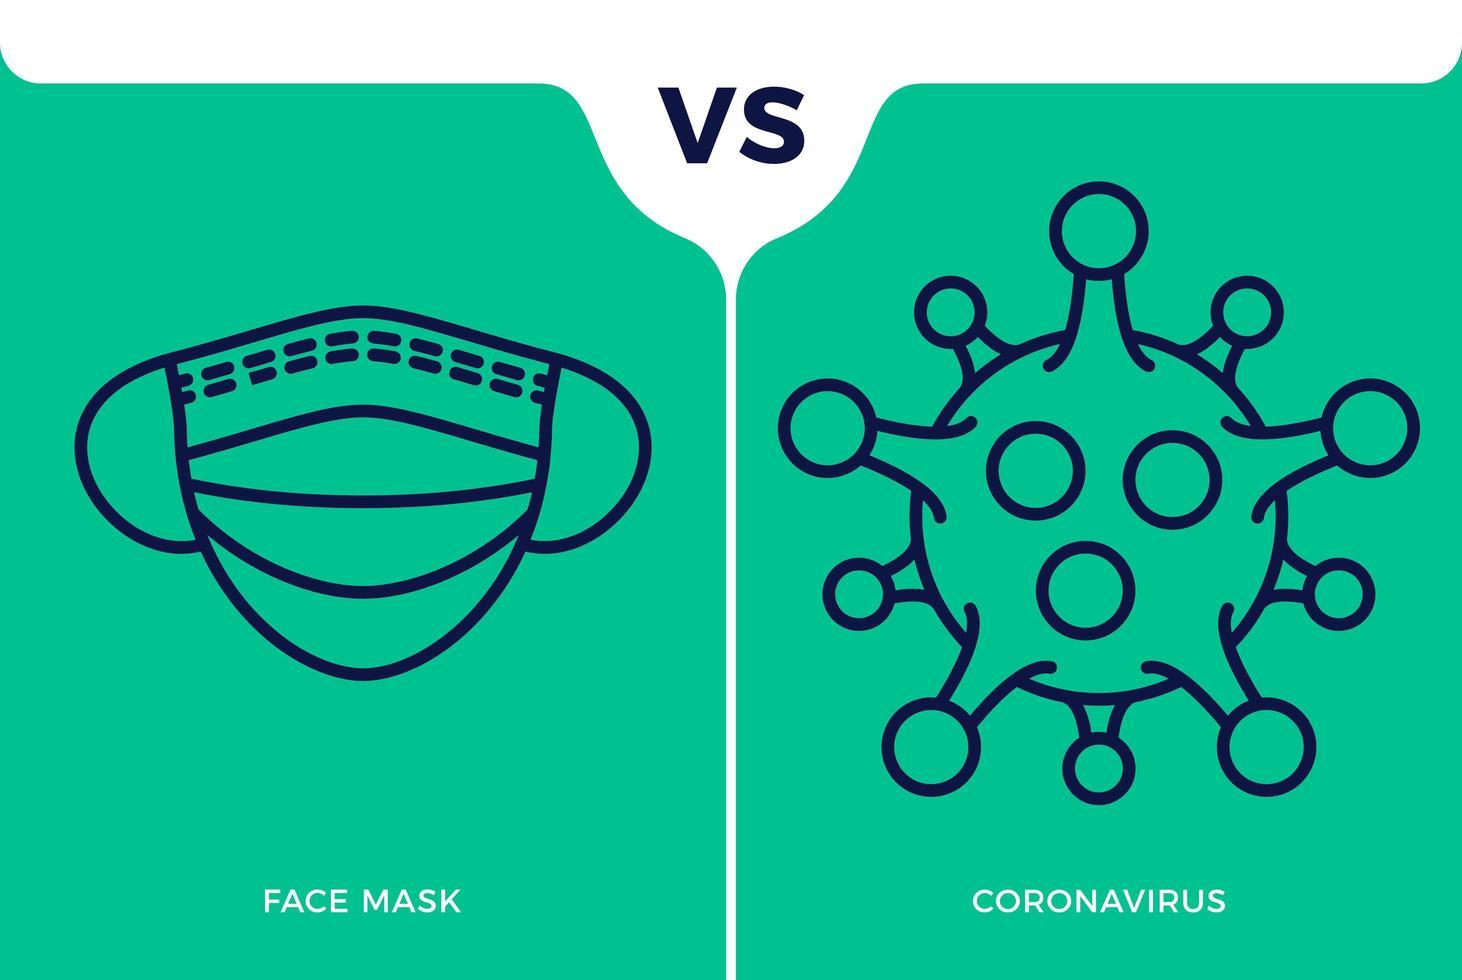 banner cara icono de máscara vs o contra coronavirus concepto protección covid-19 signo ilustración vectorial. Fondo de diseño de prevención de covid-19. vector